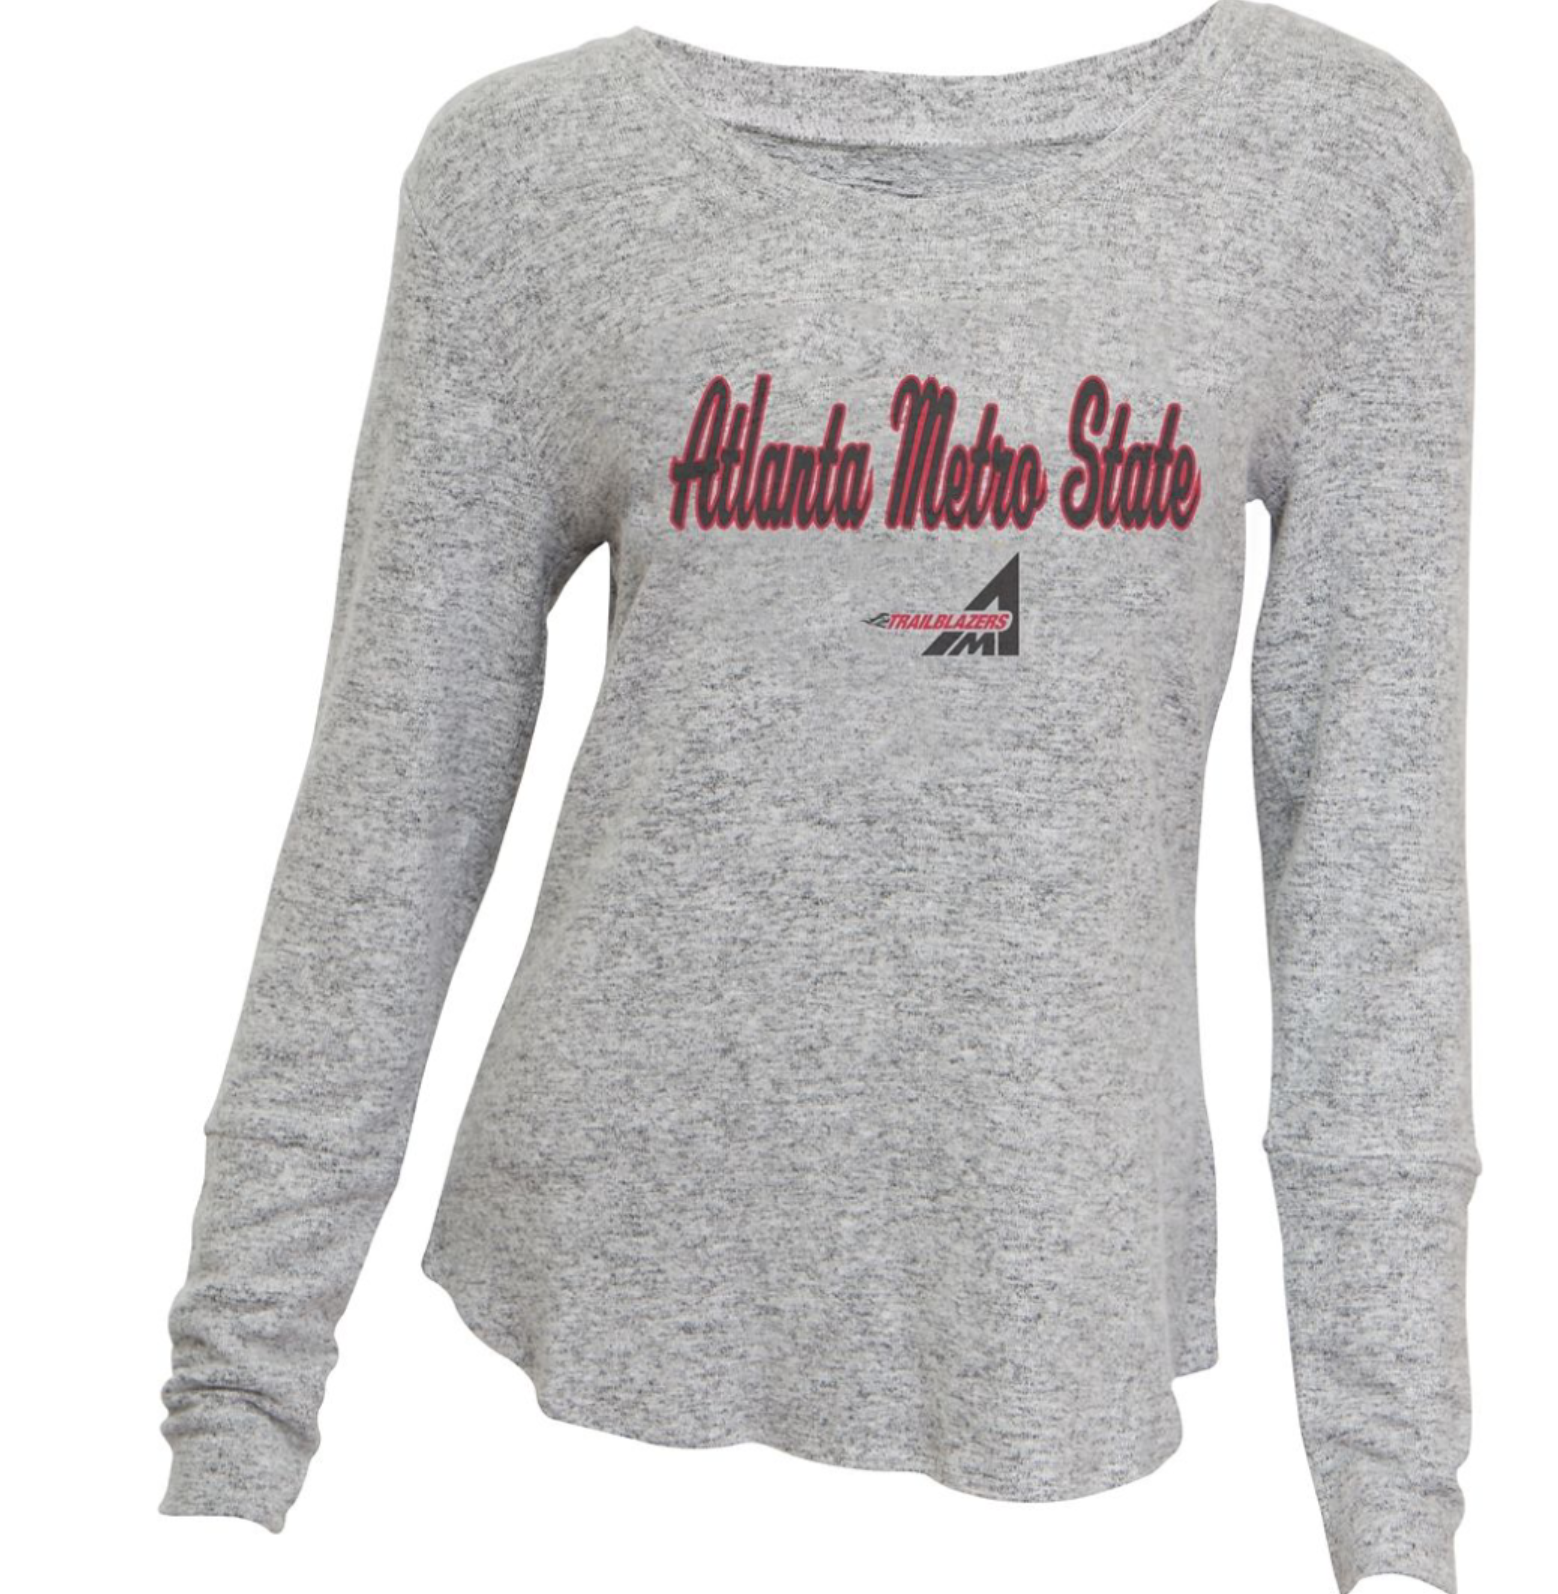 Atlanta Metropolitan State College Trailblazers Women's Long Sleeve Shirt